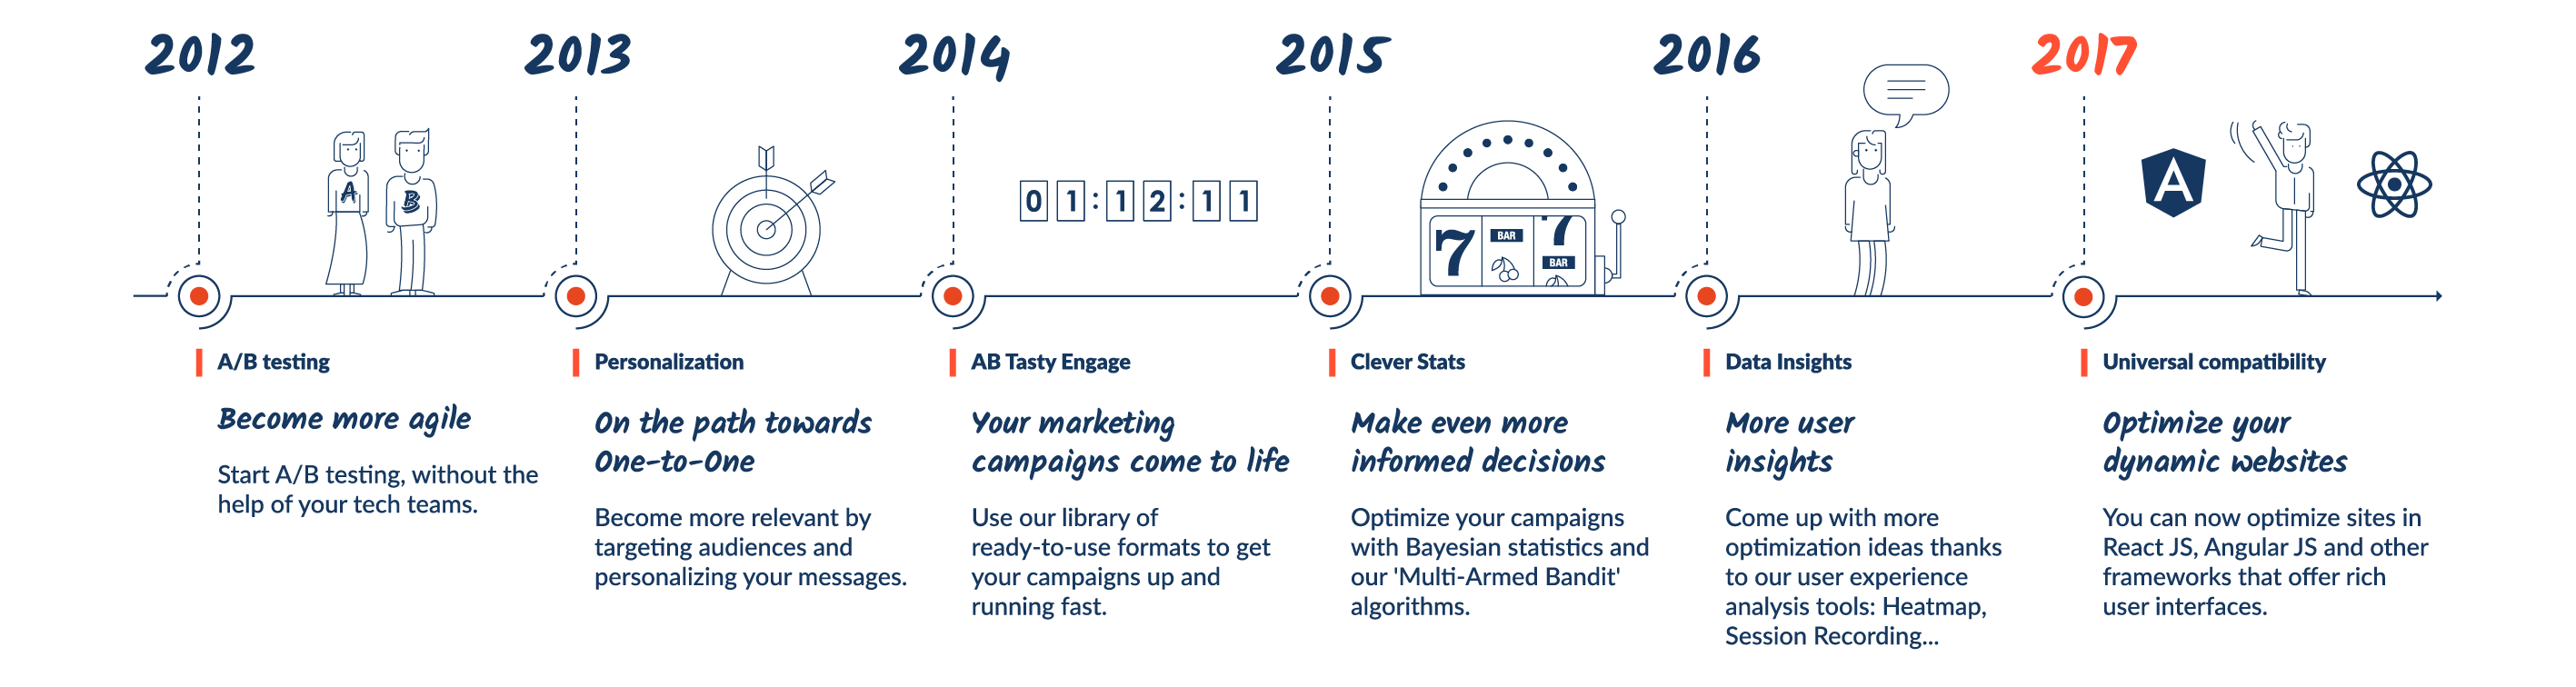 AB Tasty Innovation Timeline